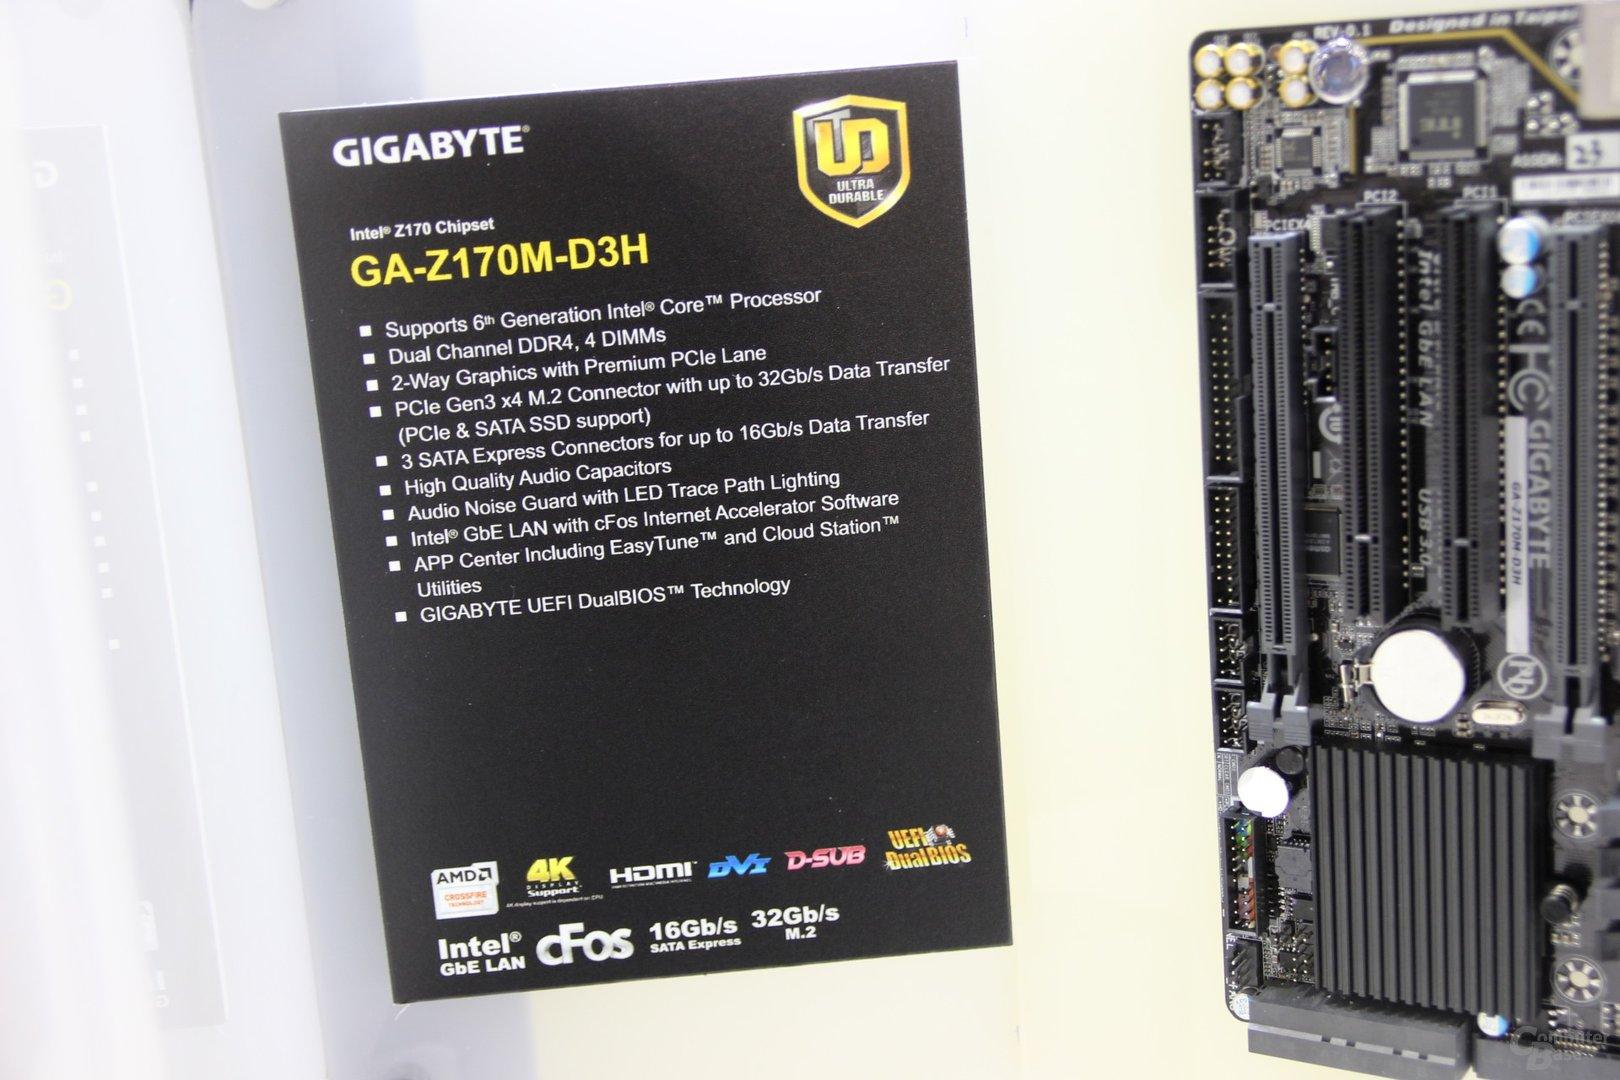 Spezifikationen des Gigabyte GA-Z170M-D3H